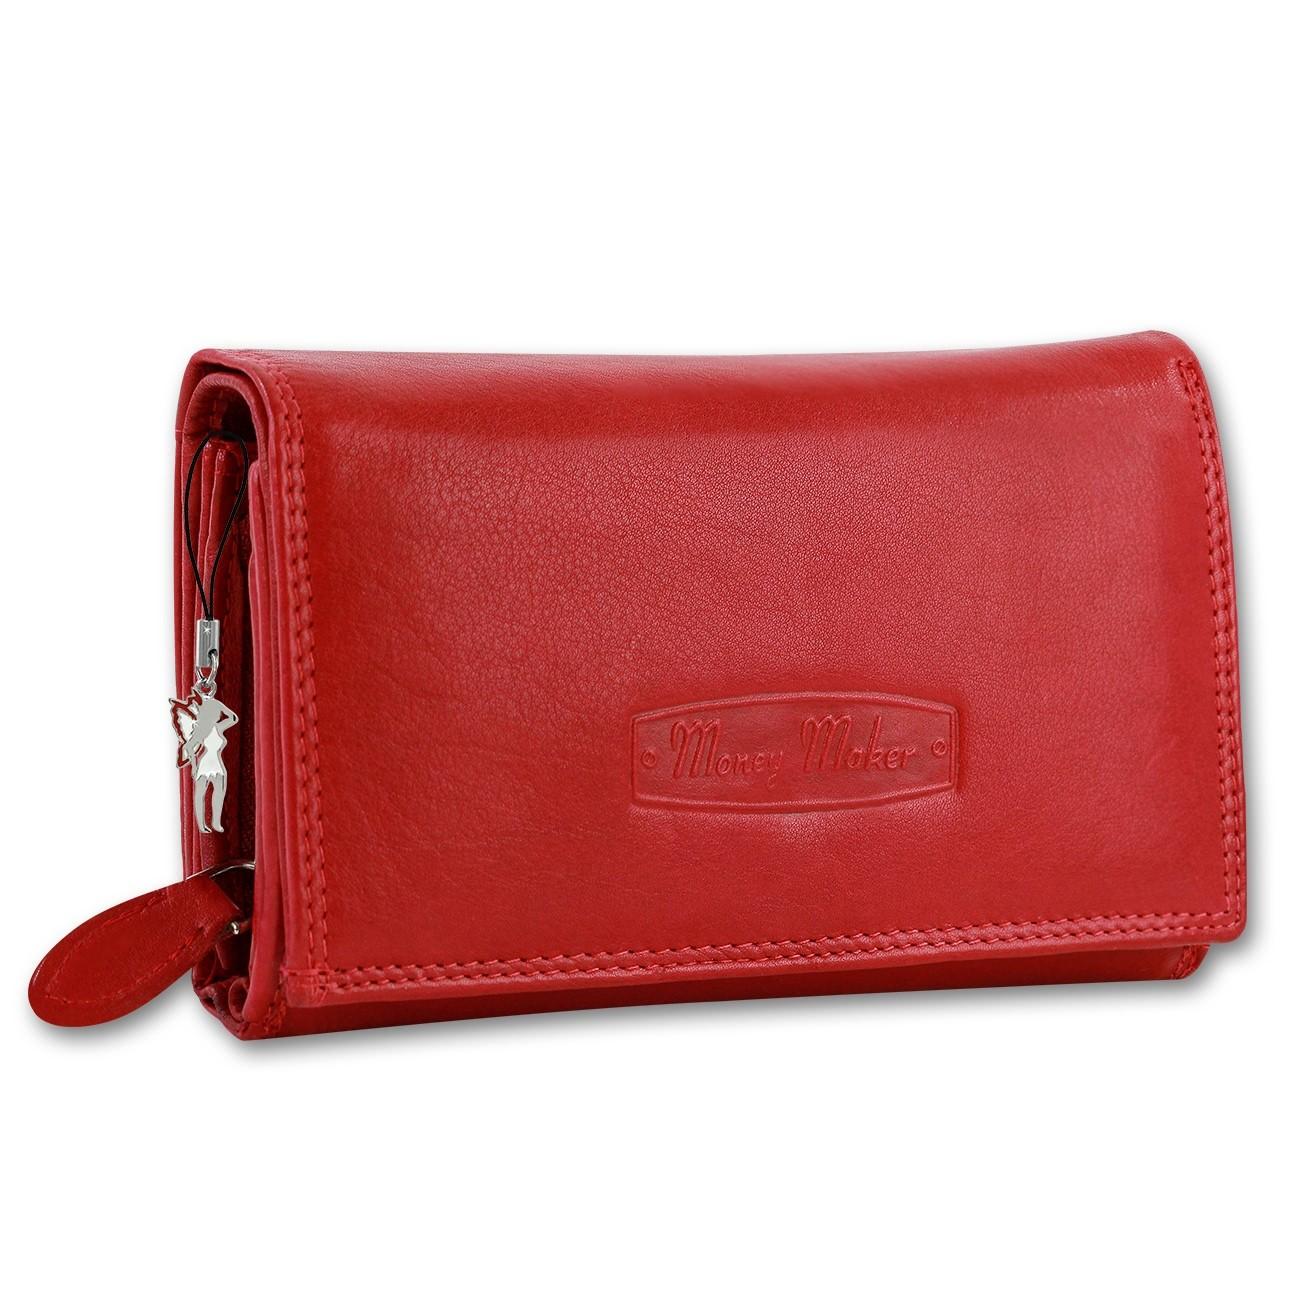 bb15638b2d286 Geldbörse Leder rot Damen Portemonnaie Kellnerbörse Money Maker OPJ704R